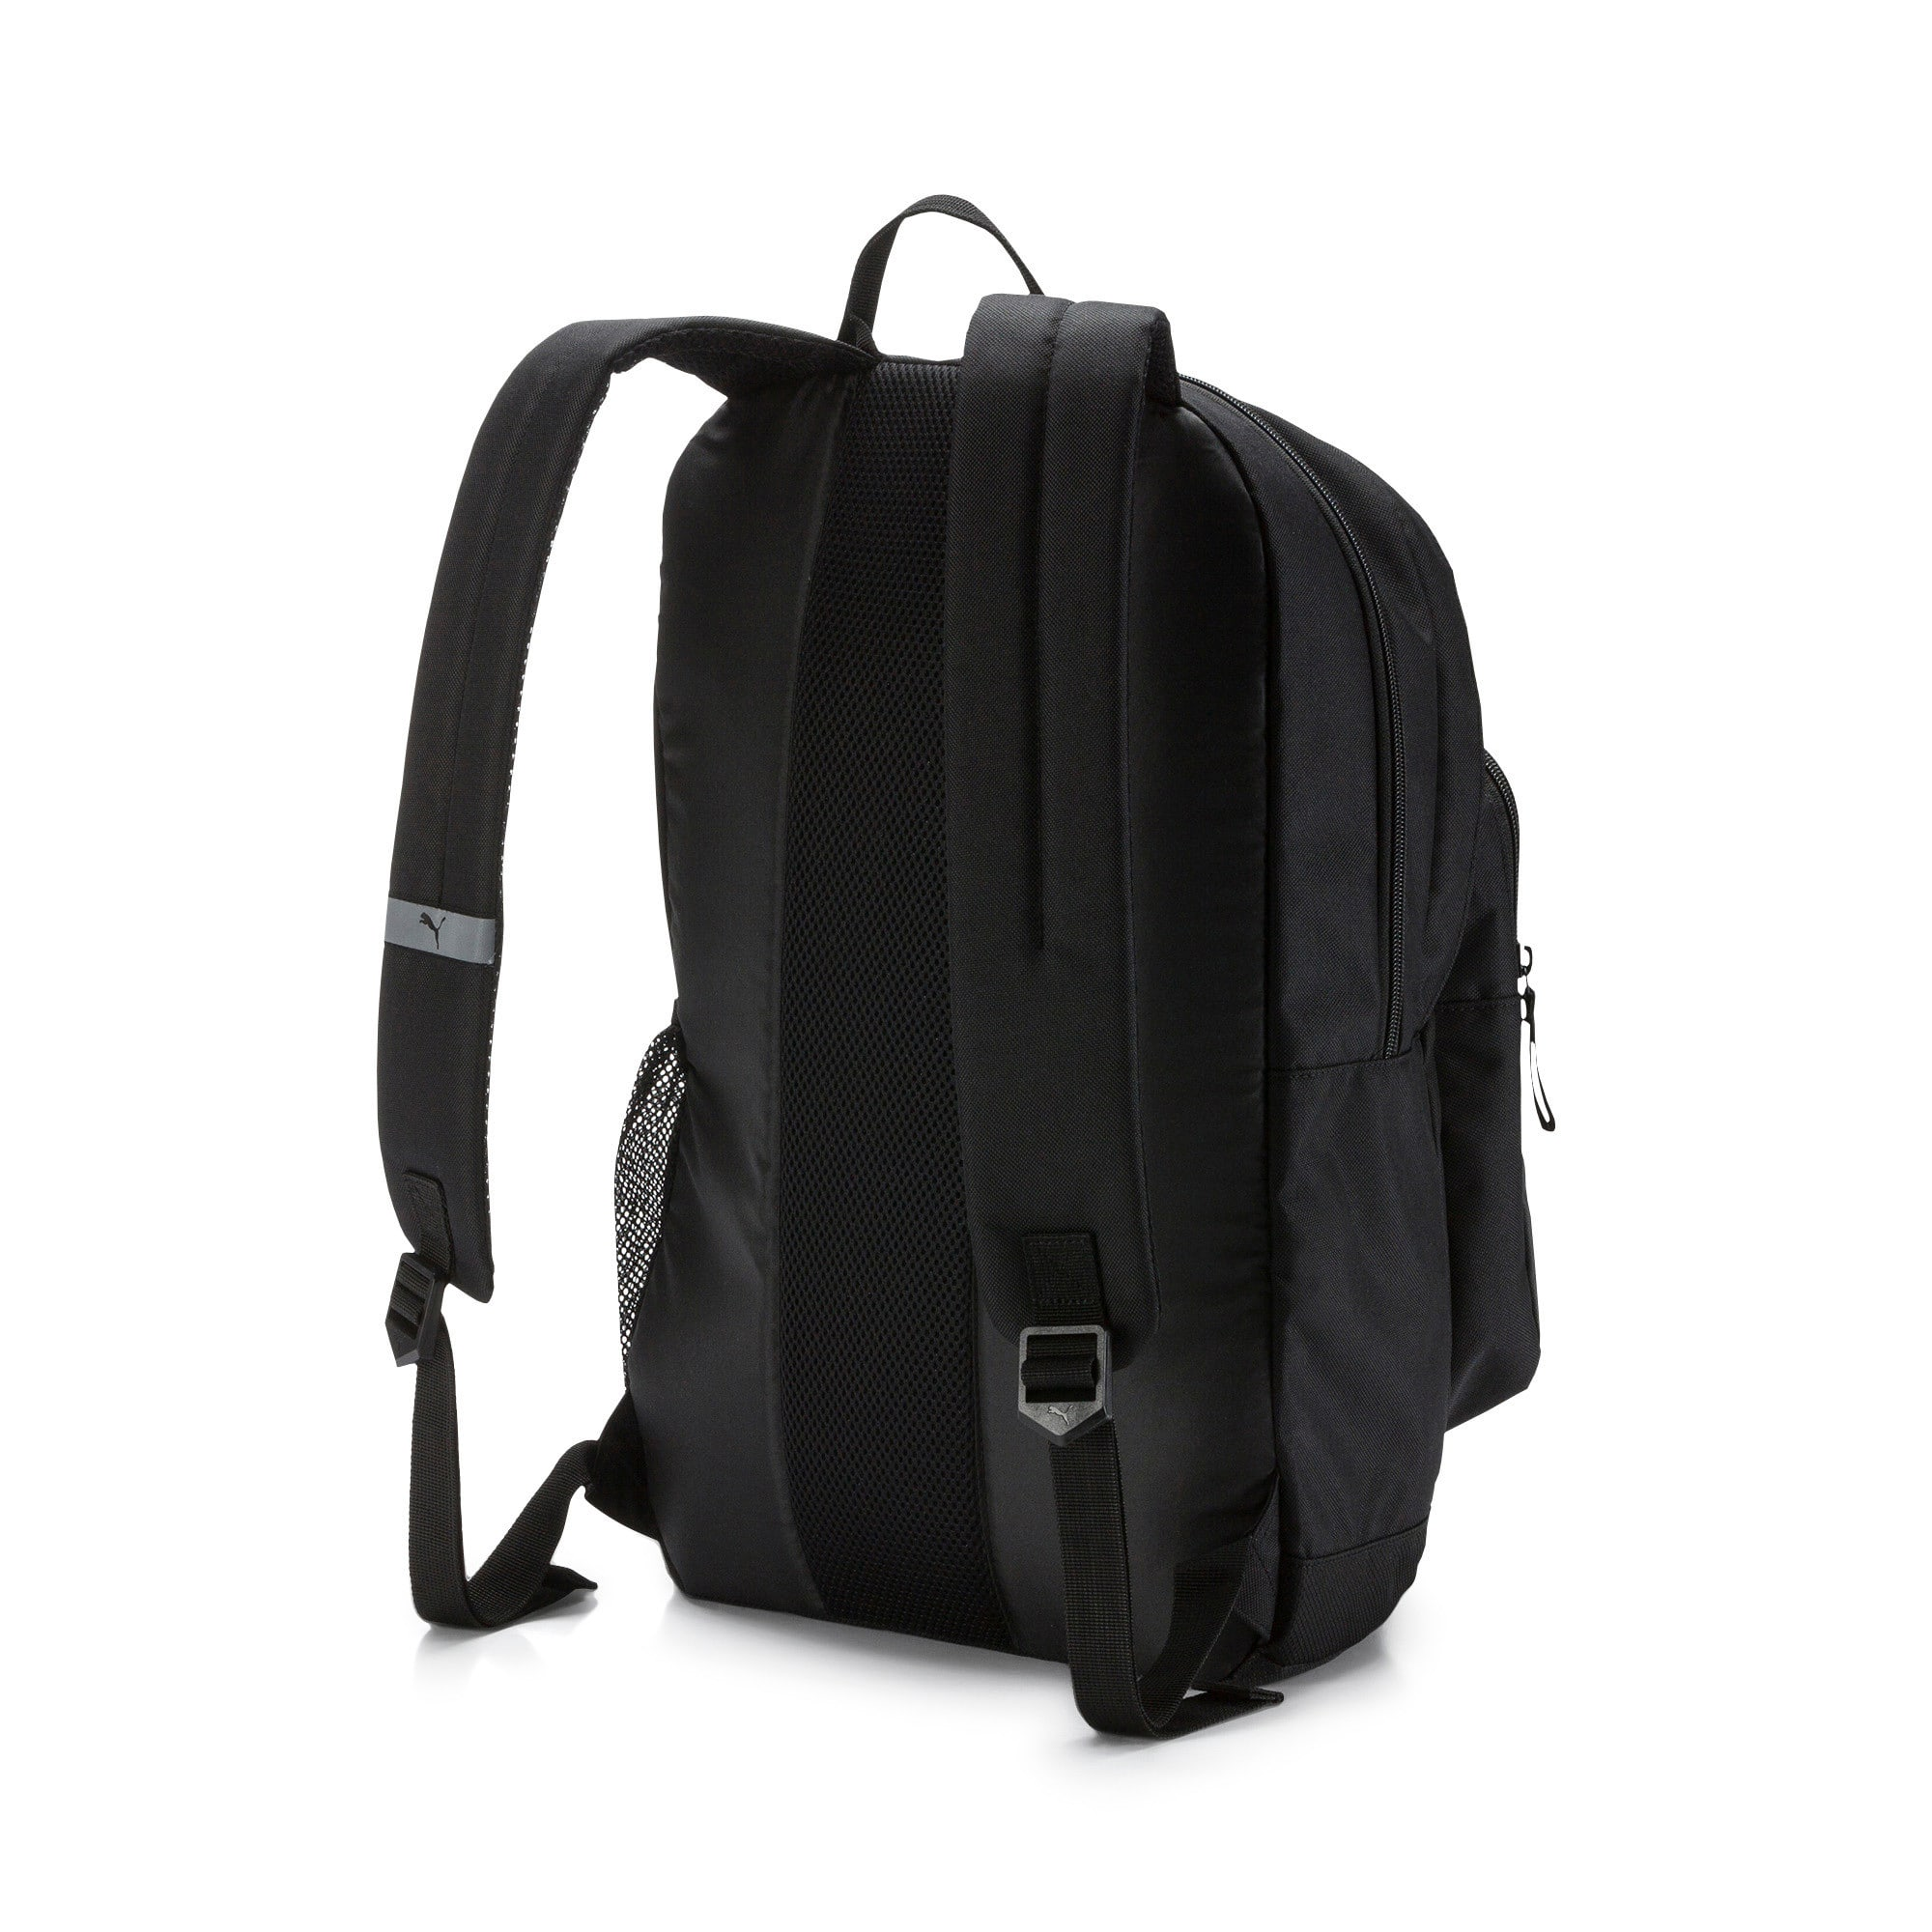 Thumbnail 3 of Deck Backpack II, Puma Black, medium